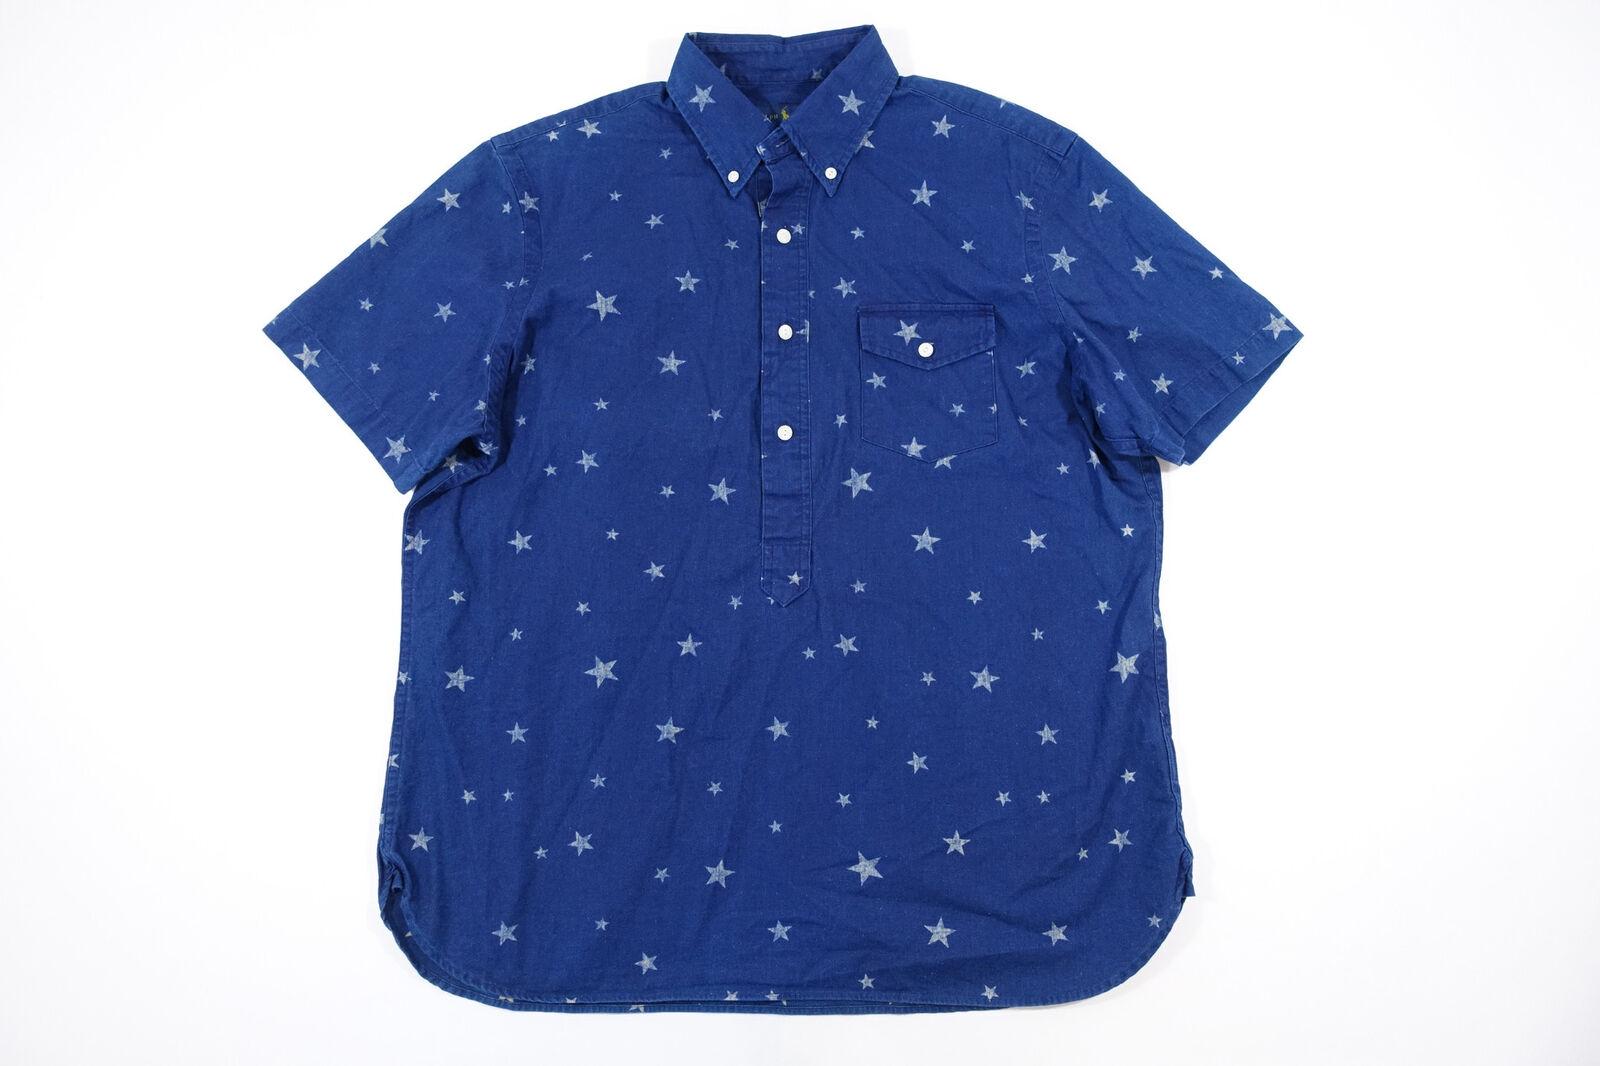 24877ce1 LAUREN FOURTH XS X SMALL STARS PRINT SHORT SLEEVE HALF BUTTON FRONT SHIRT  RALPH npnzpc230-Casual Button-Down Shirts